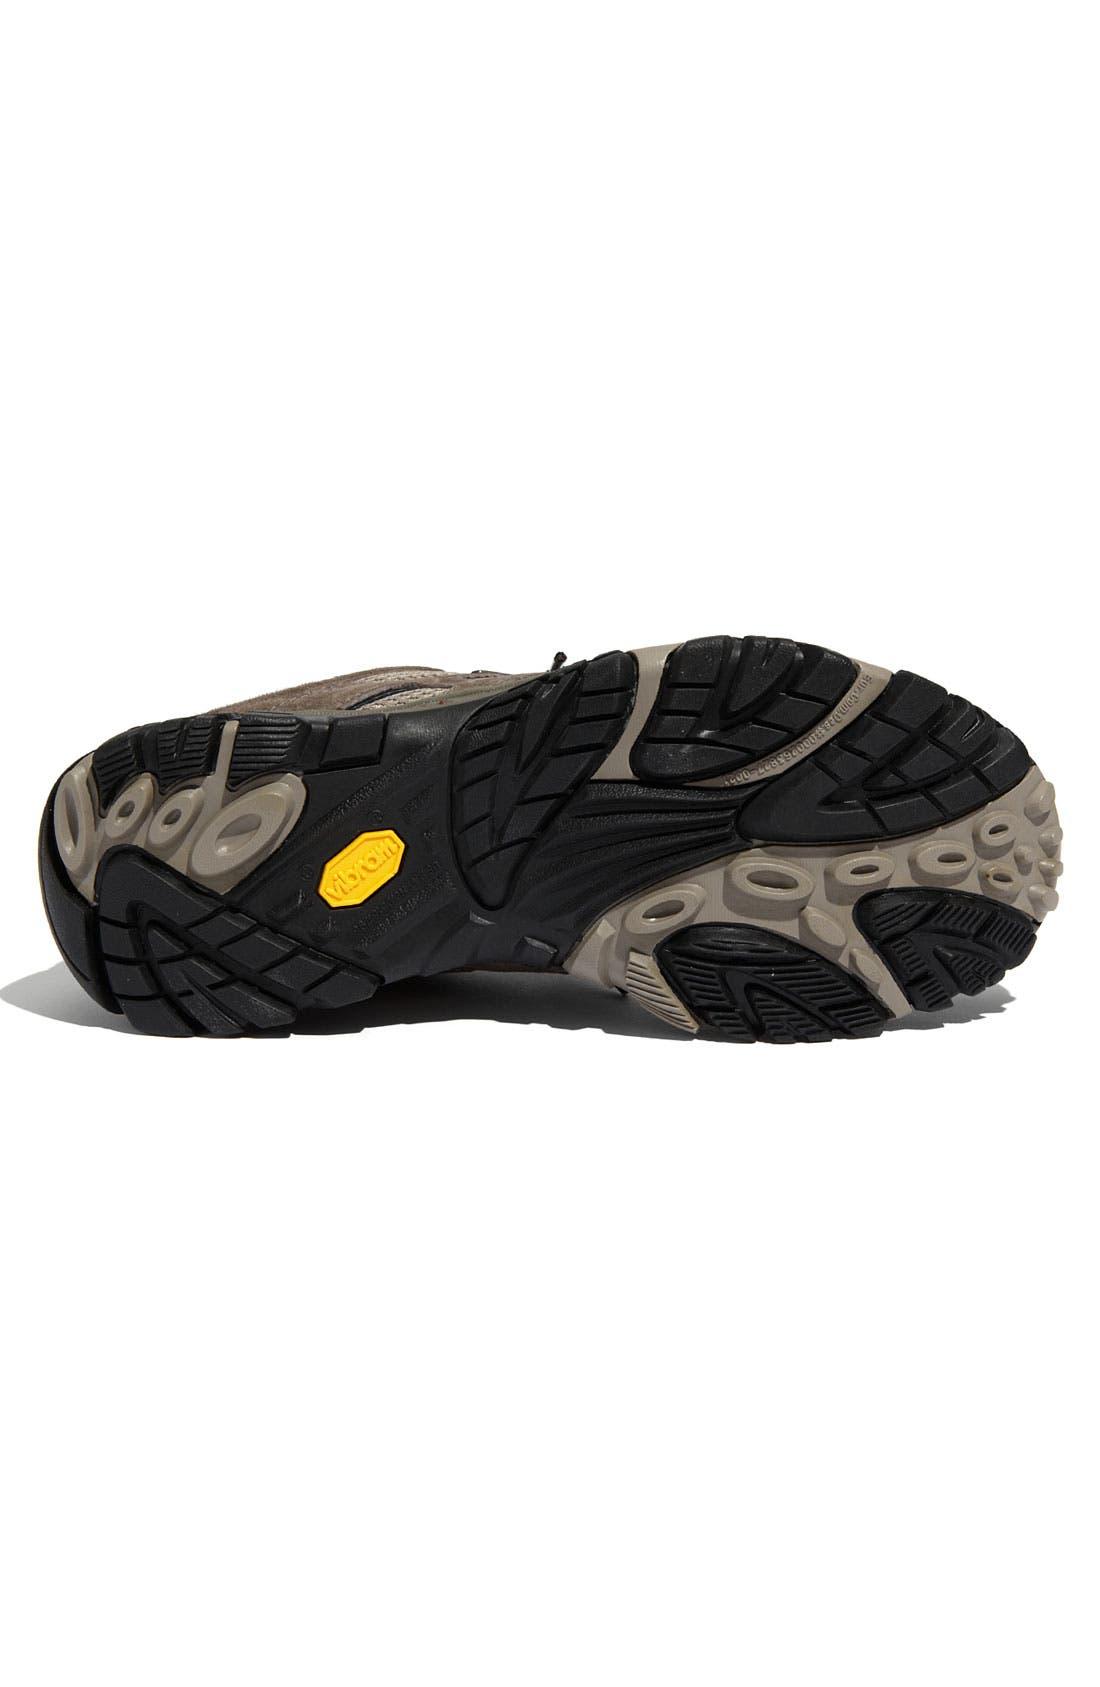 Alternate Image 4  - Merrell 'Moab' Waterproof Hiking Shoe (Men)